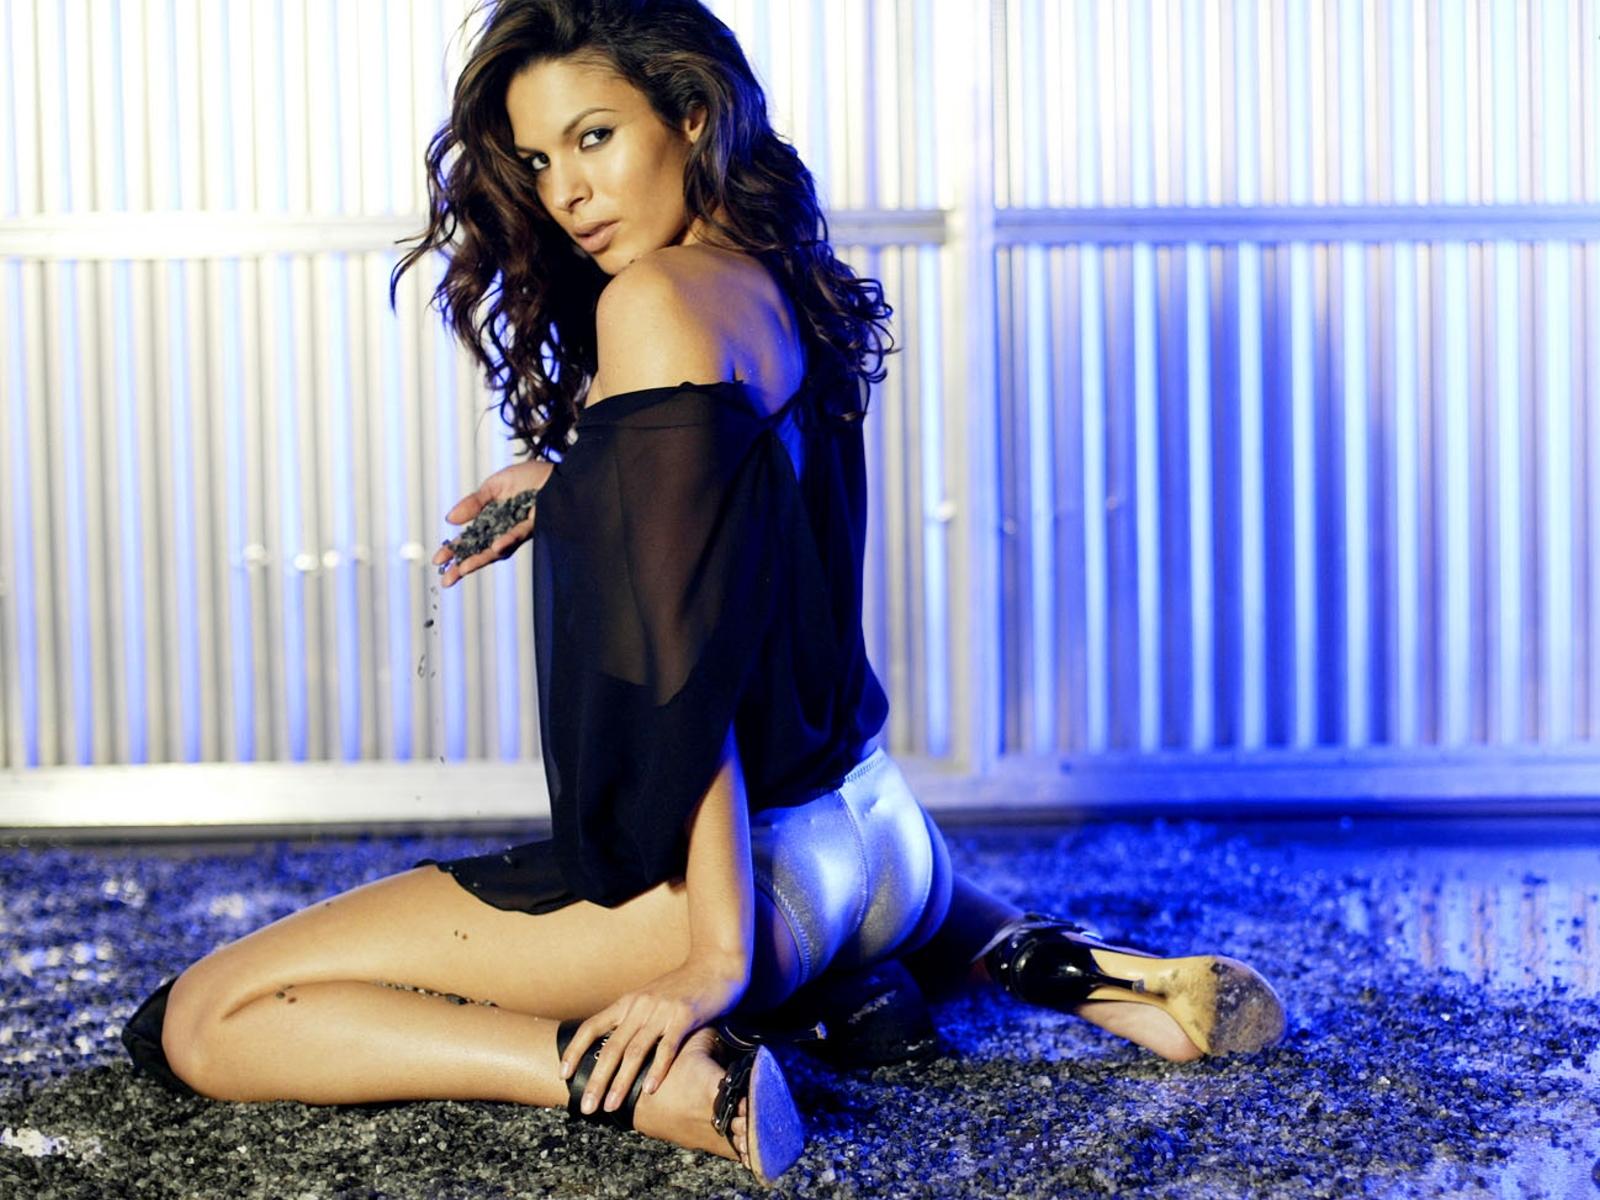 http://2.bp.blogspot.com/-ZNQYw0xMXvc/TfDunGbFWfI/AAAAAAAAAJI/2mM854WP0i0/s1600/Nadine_Velazquez_001_3059_Wallpaper.jpg